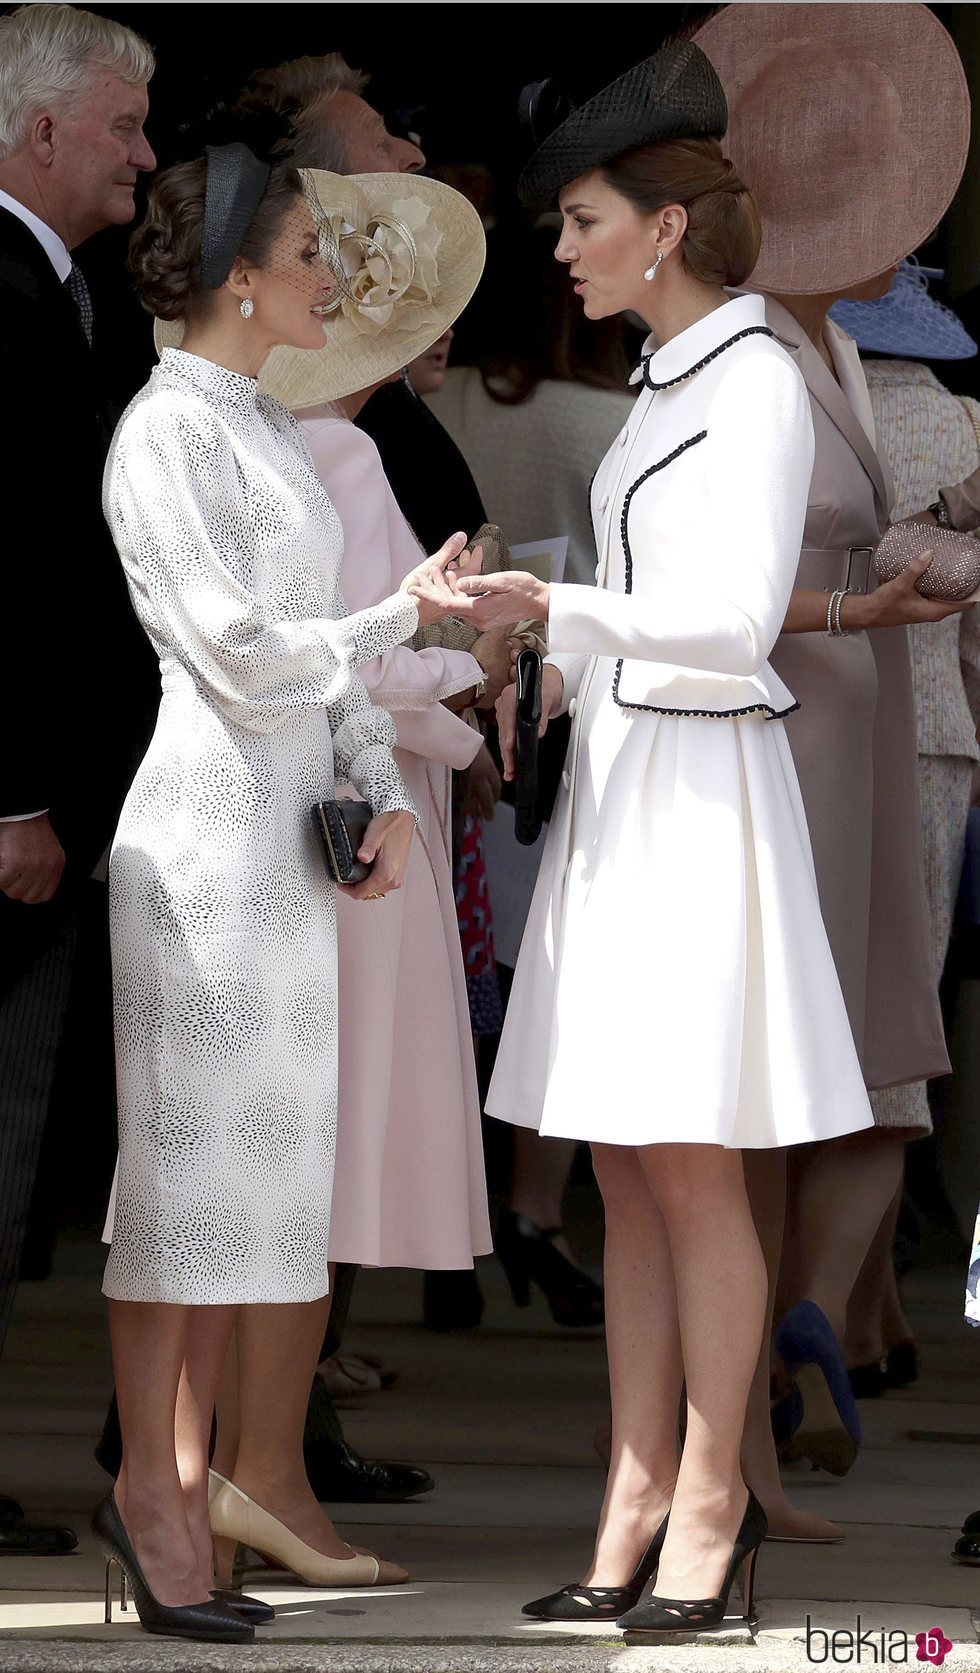 La Reina Letizia y Kate Middleton hablando en la procesión de la Orden de la Jarretera